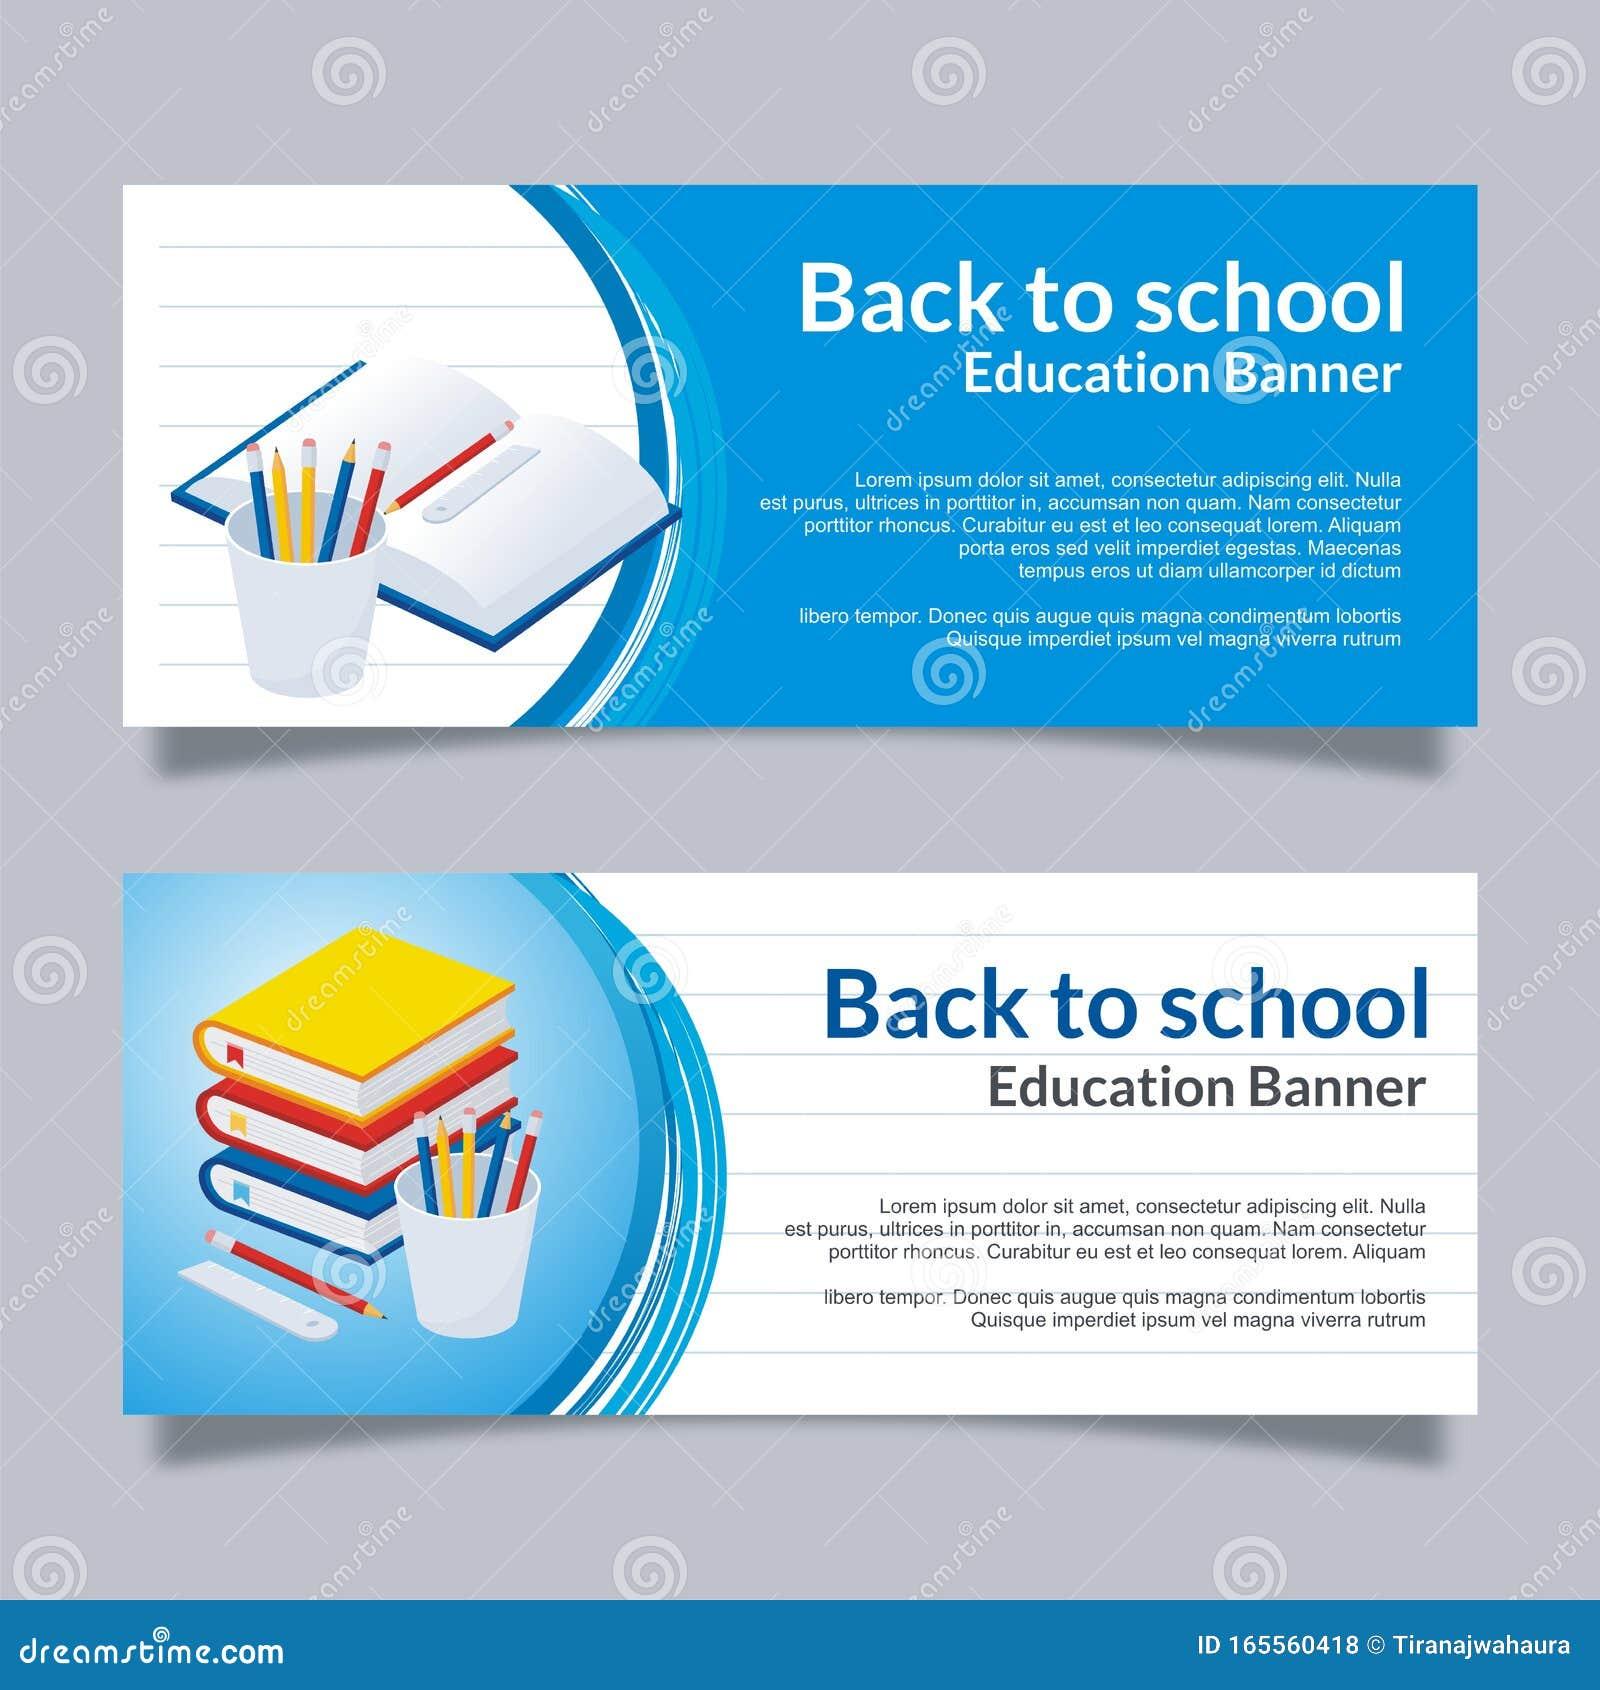 Education University Banner With Modern Design Stock Vector Illustration Of Academy Degree 165560418